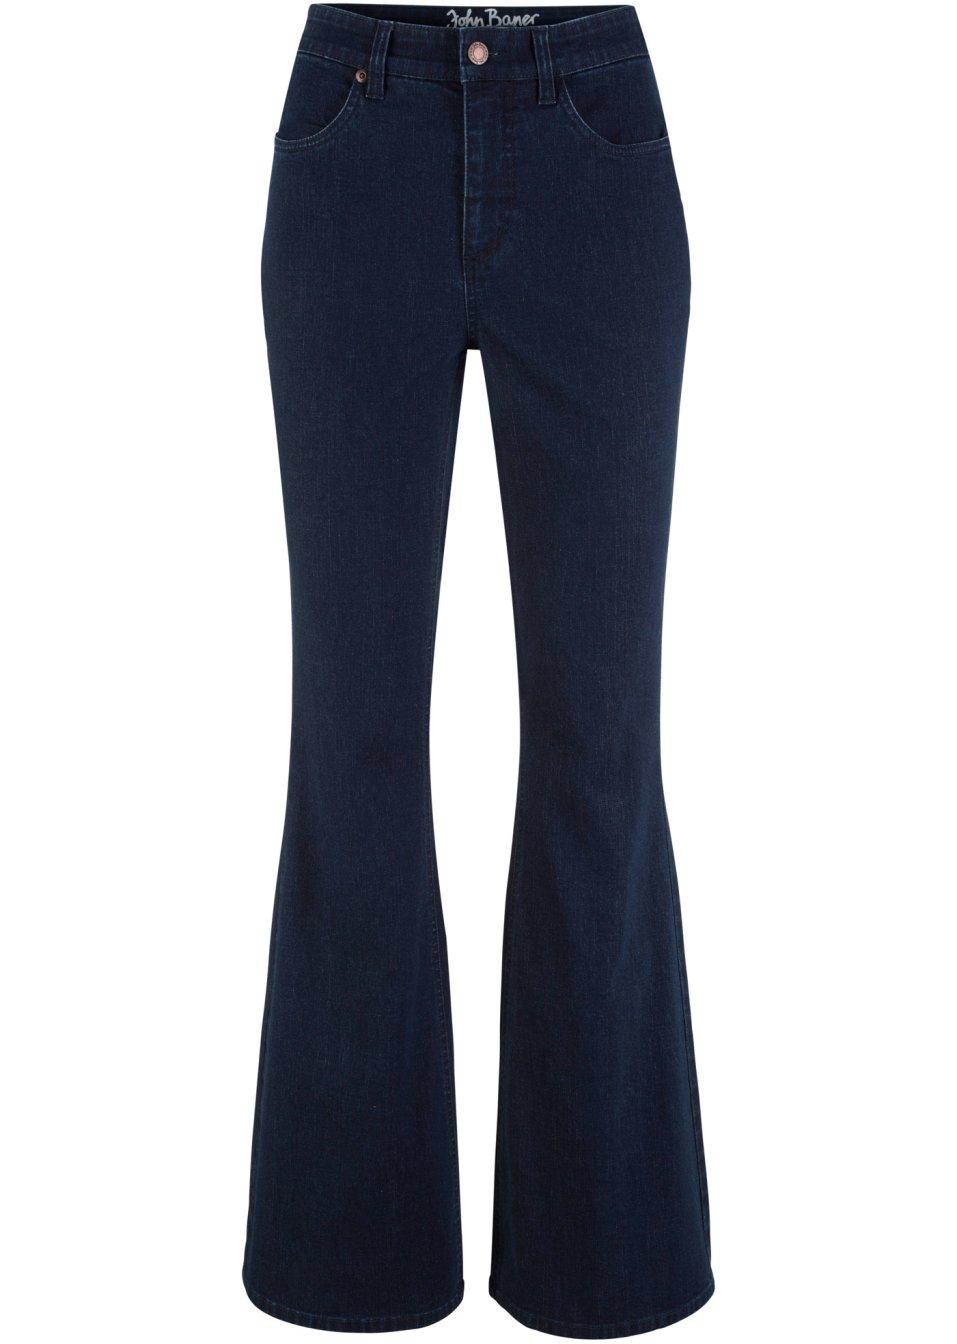 Basic-Soft-Stretch-Jeans - dunkelblau Normal tMGPL Waz8b